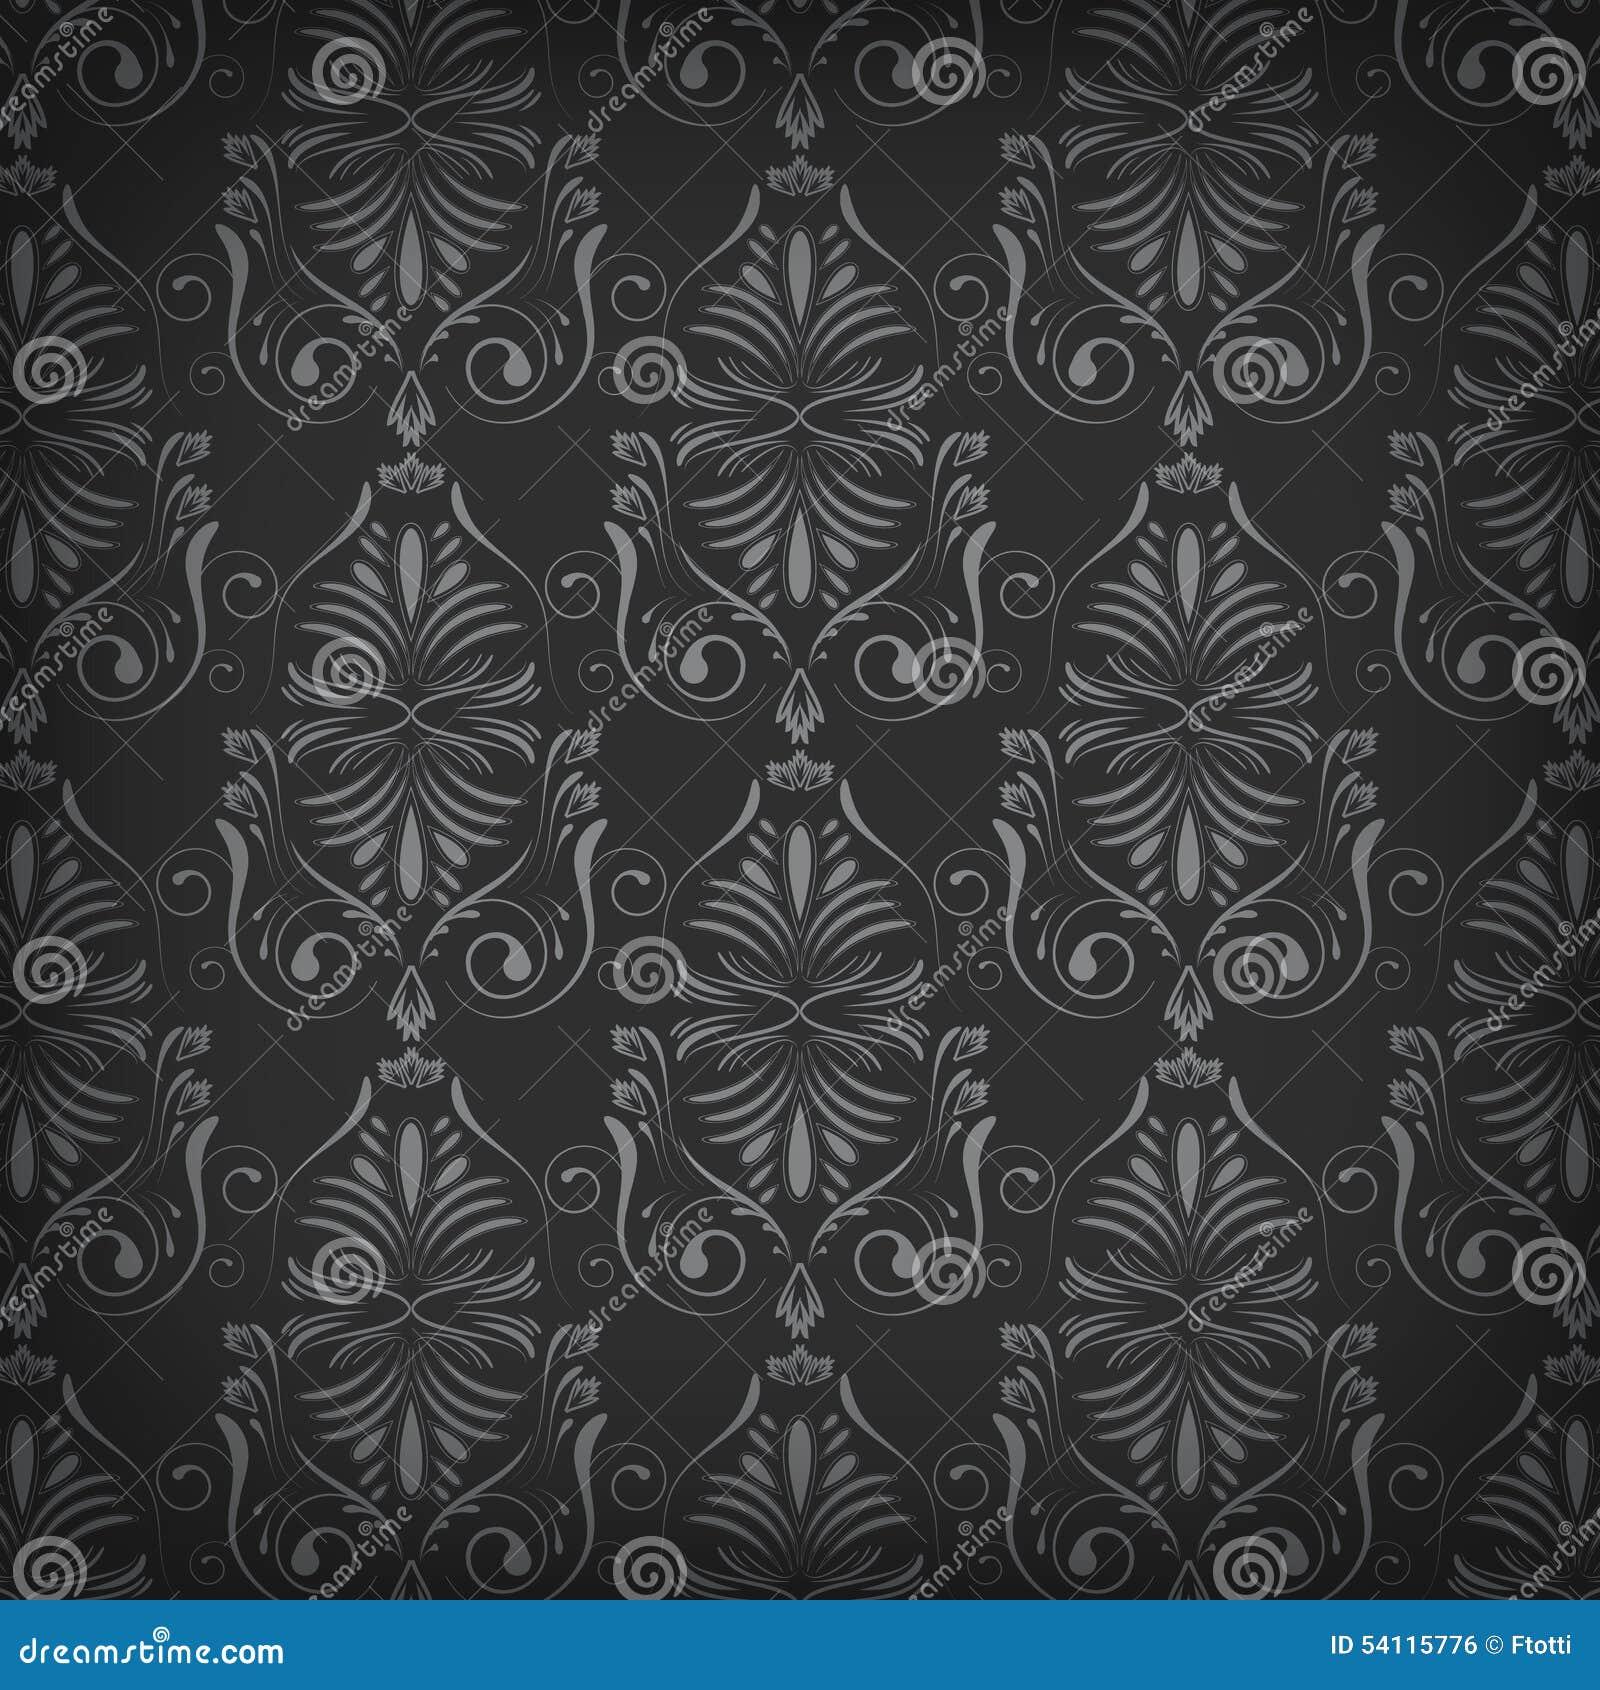 Dunkle Tapete Mit Nahtlosem Muster Vektor Abbildung Illustration